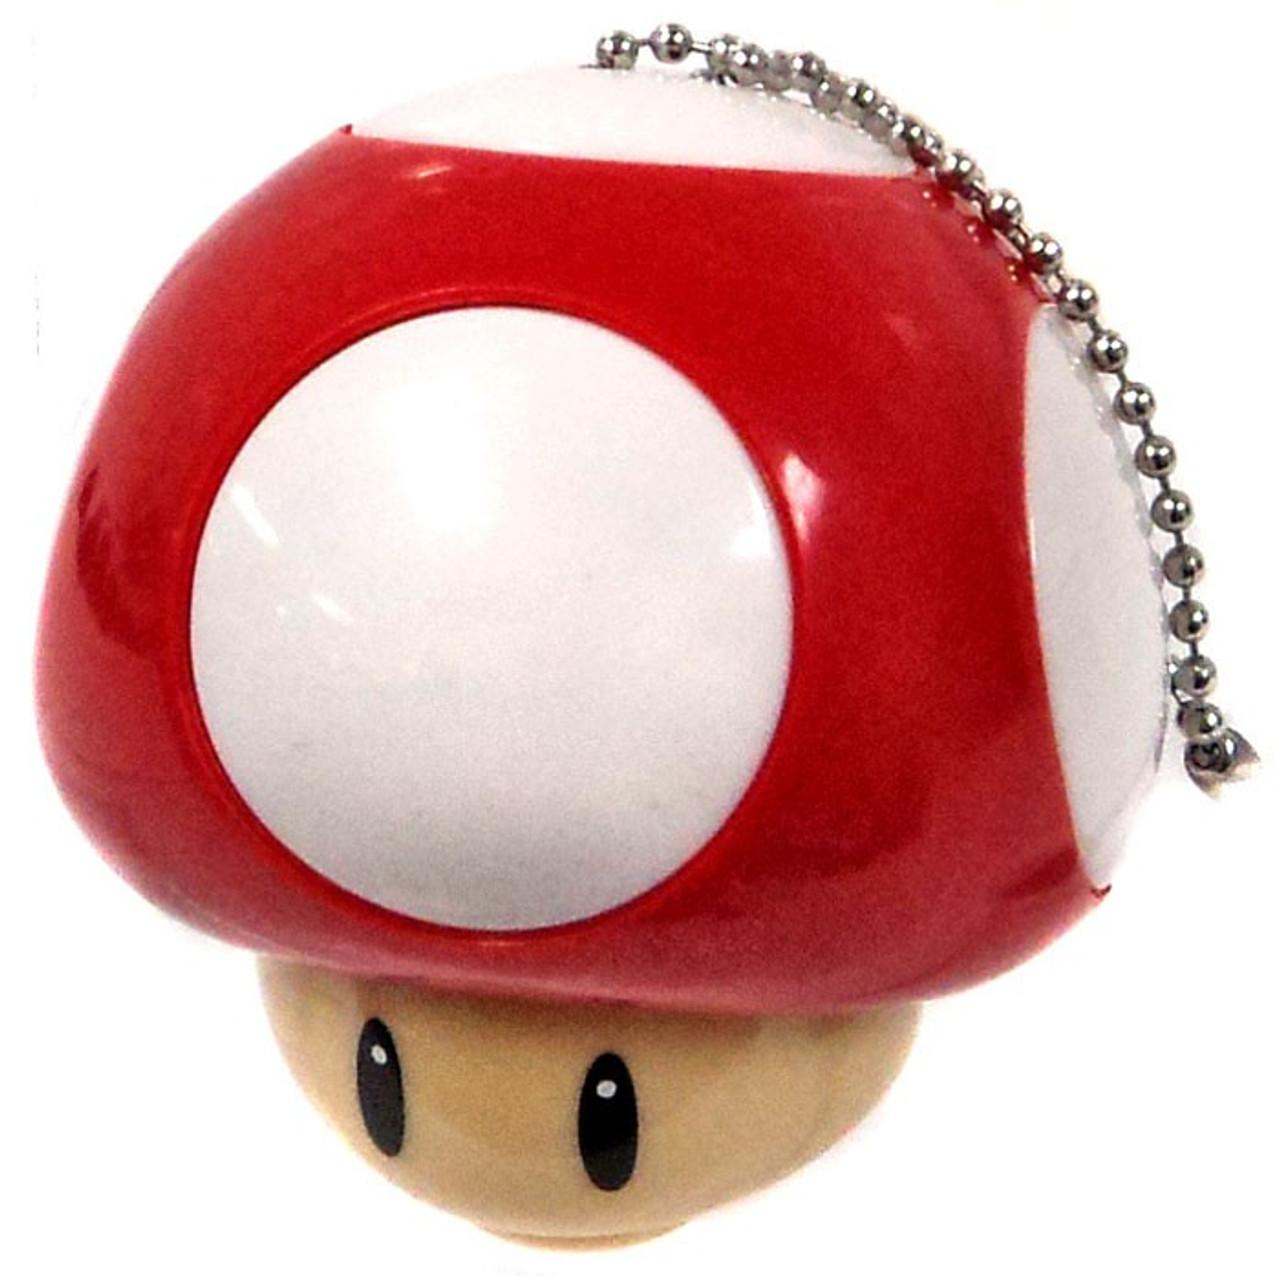 New Super Mario Bros 2 Red Mushroom Projection Light Tomy Toywiz